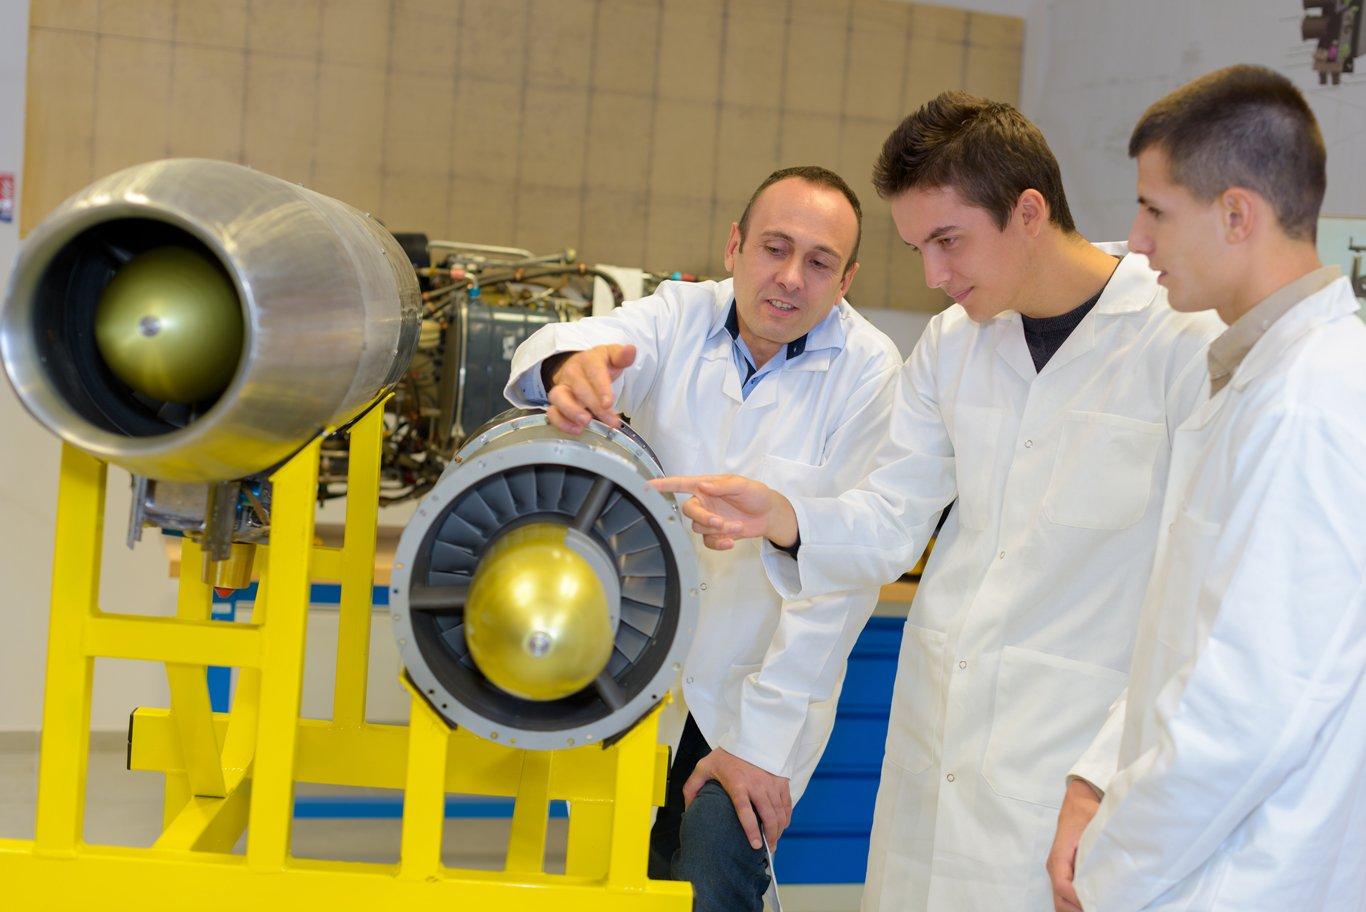 Aaerospace-Engineers-1366-1218